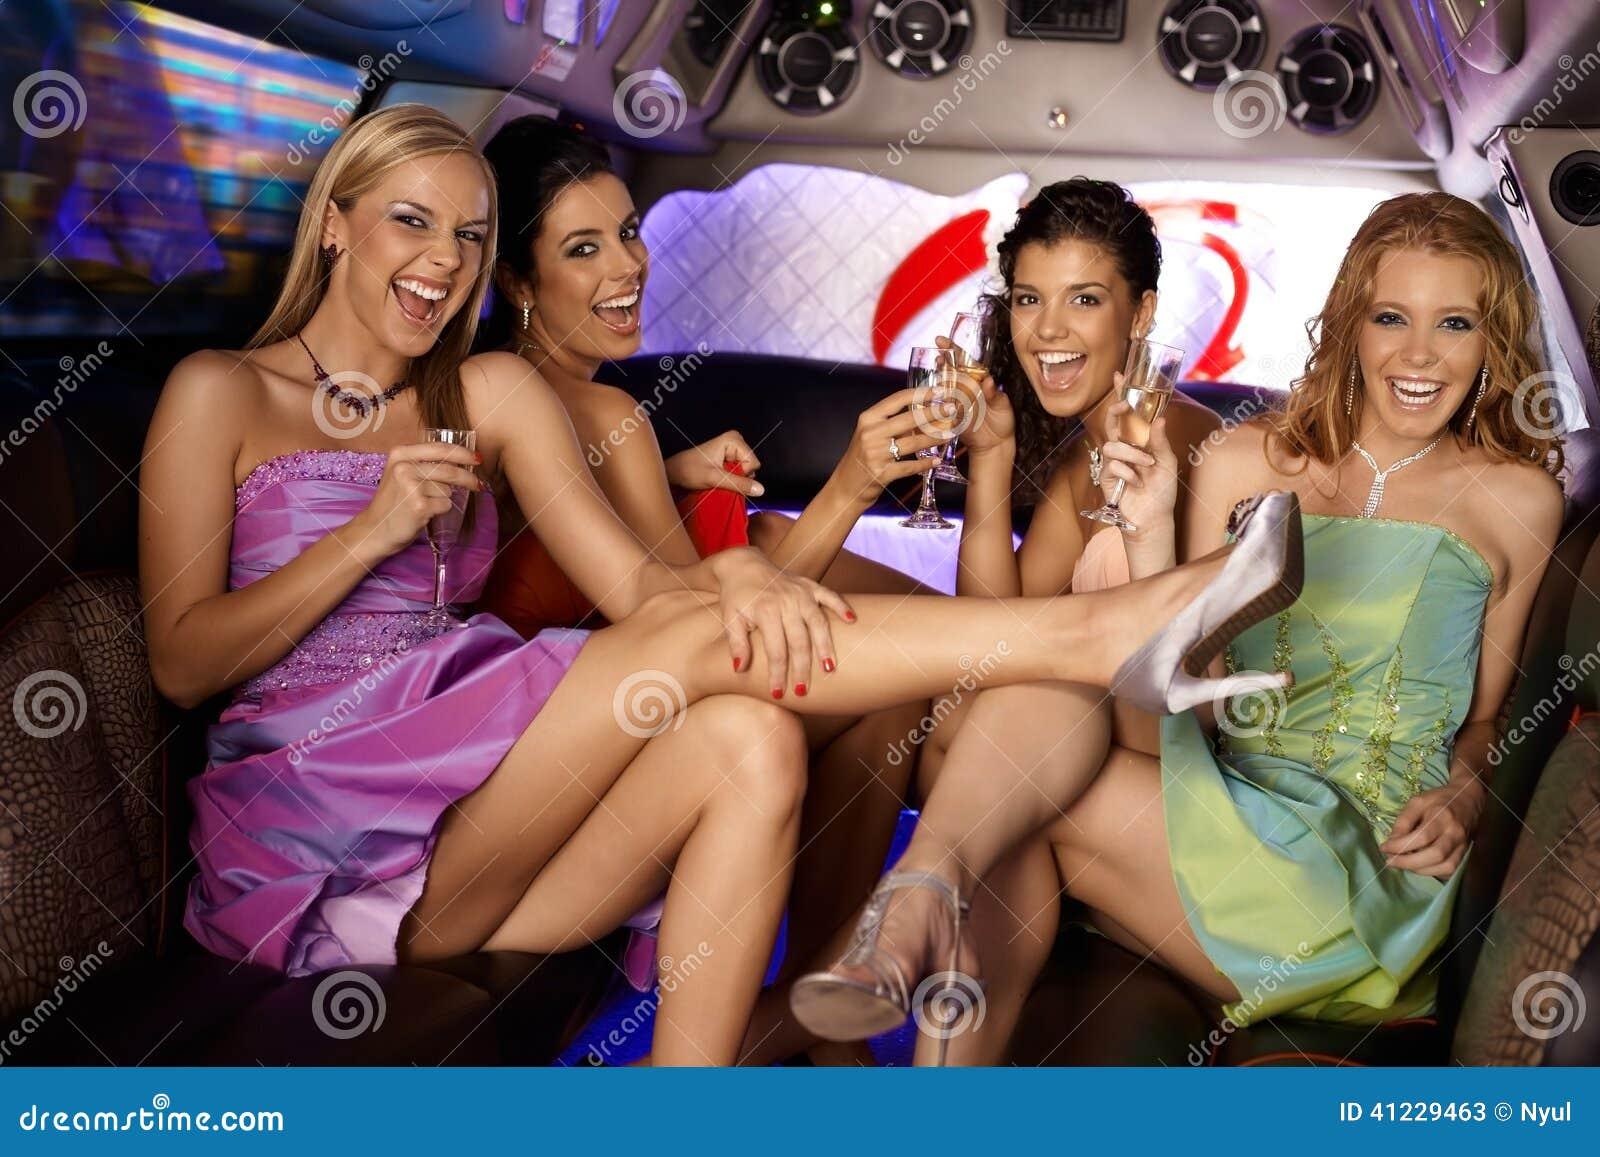 Girls having sexy